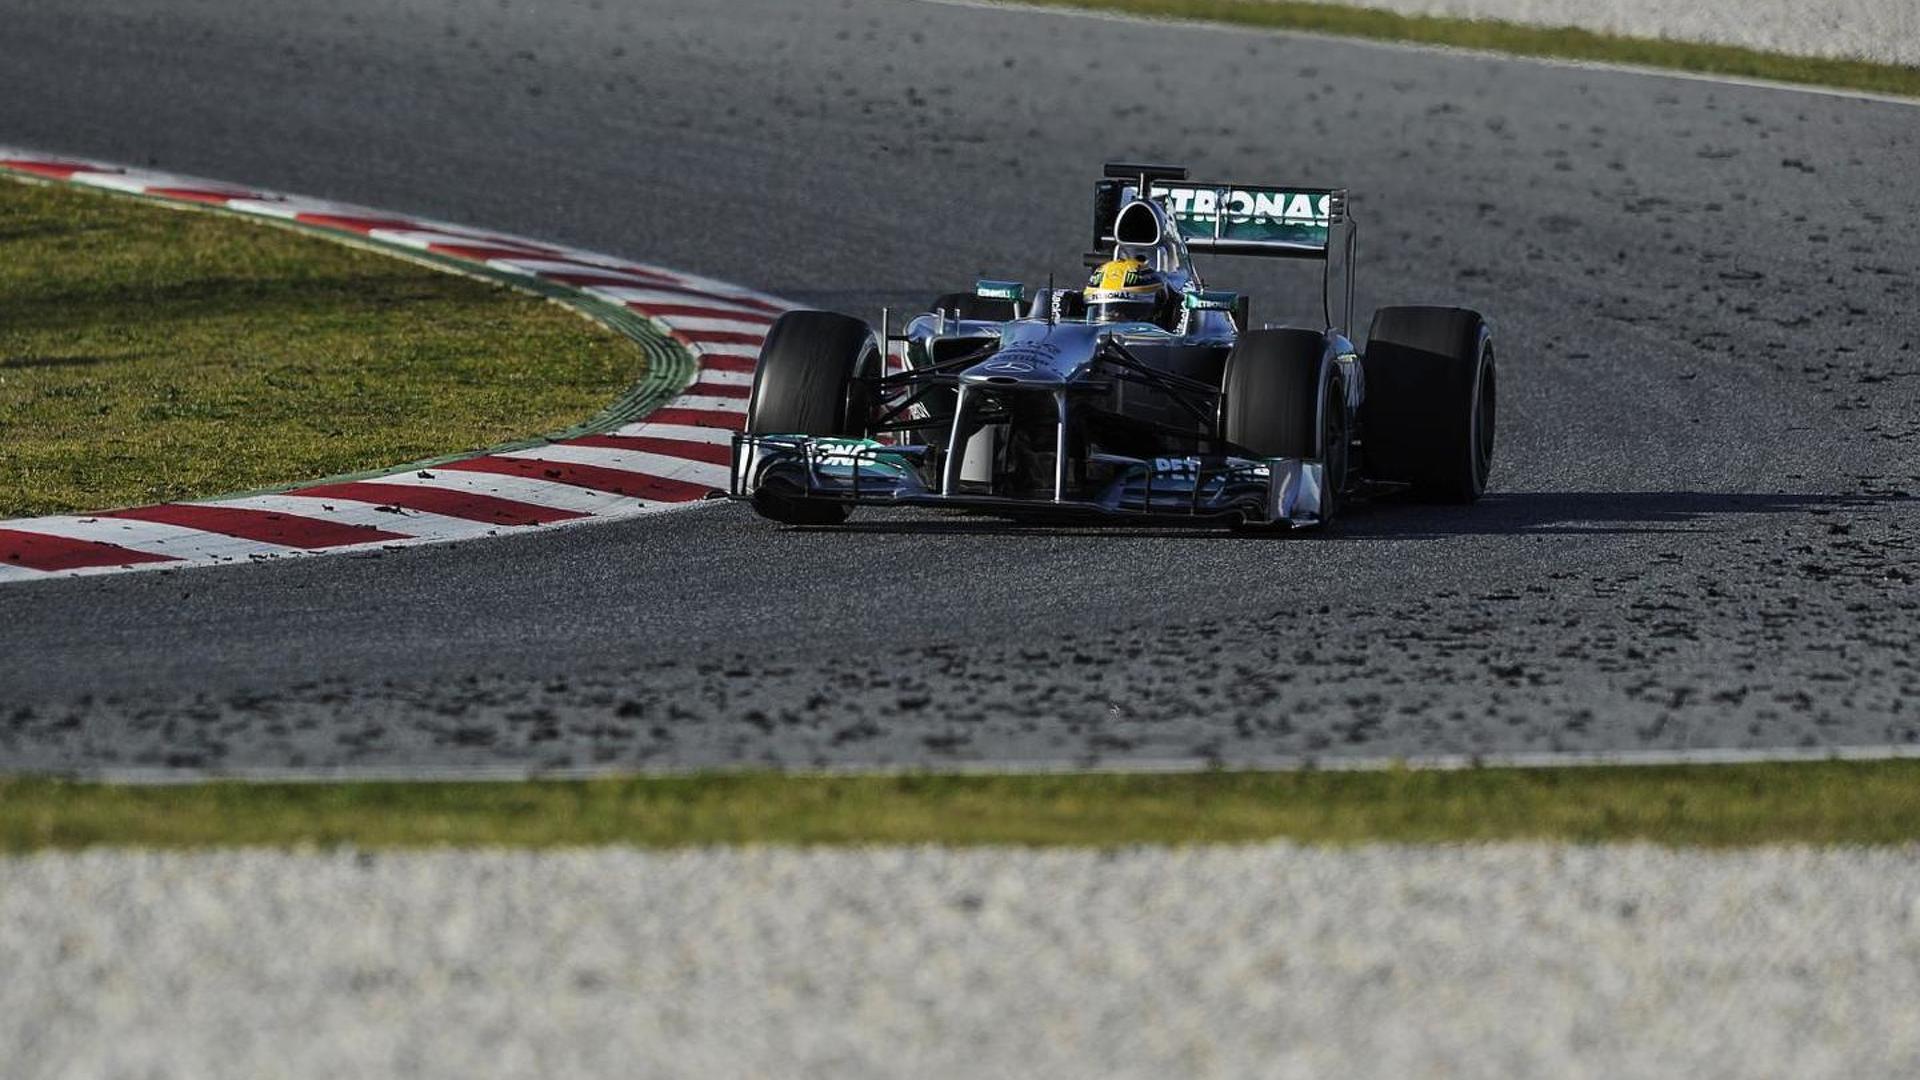 Pirelli vows to address 'marbles' problem